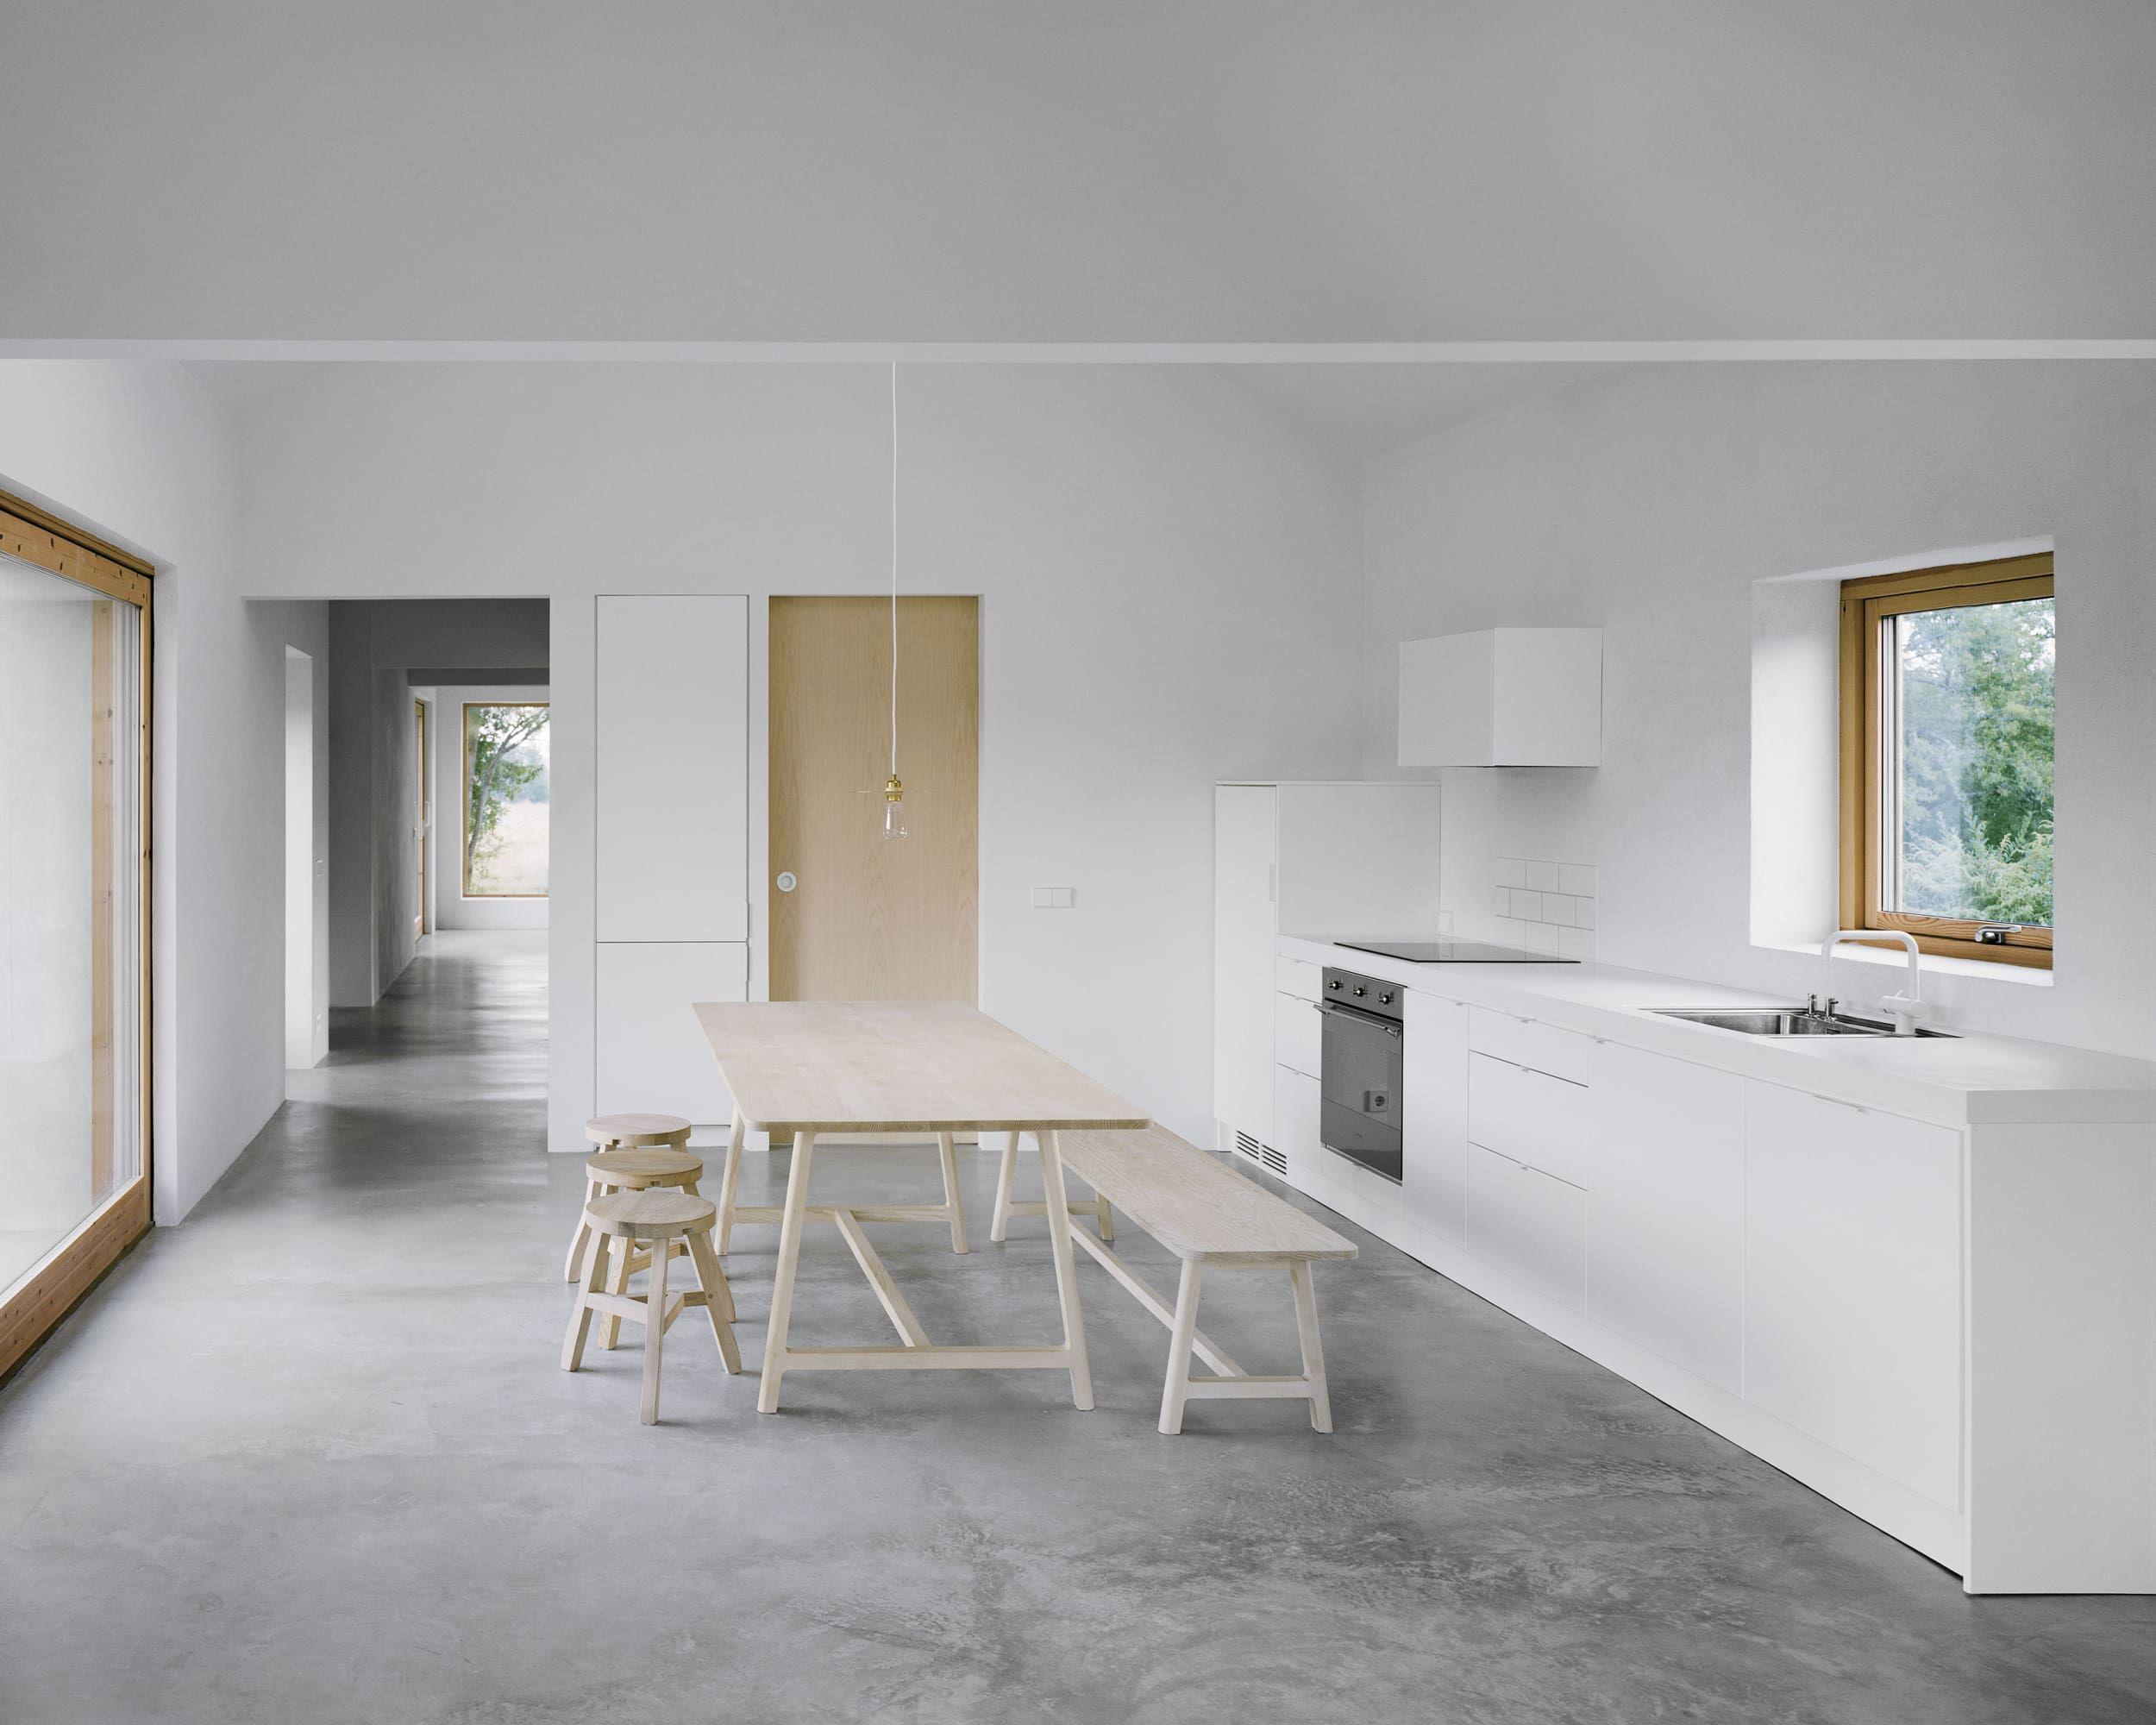 Badezimmer design stand-up-dusche frank diedert frankdiedert on pinterest